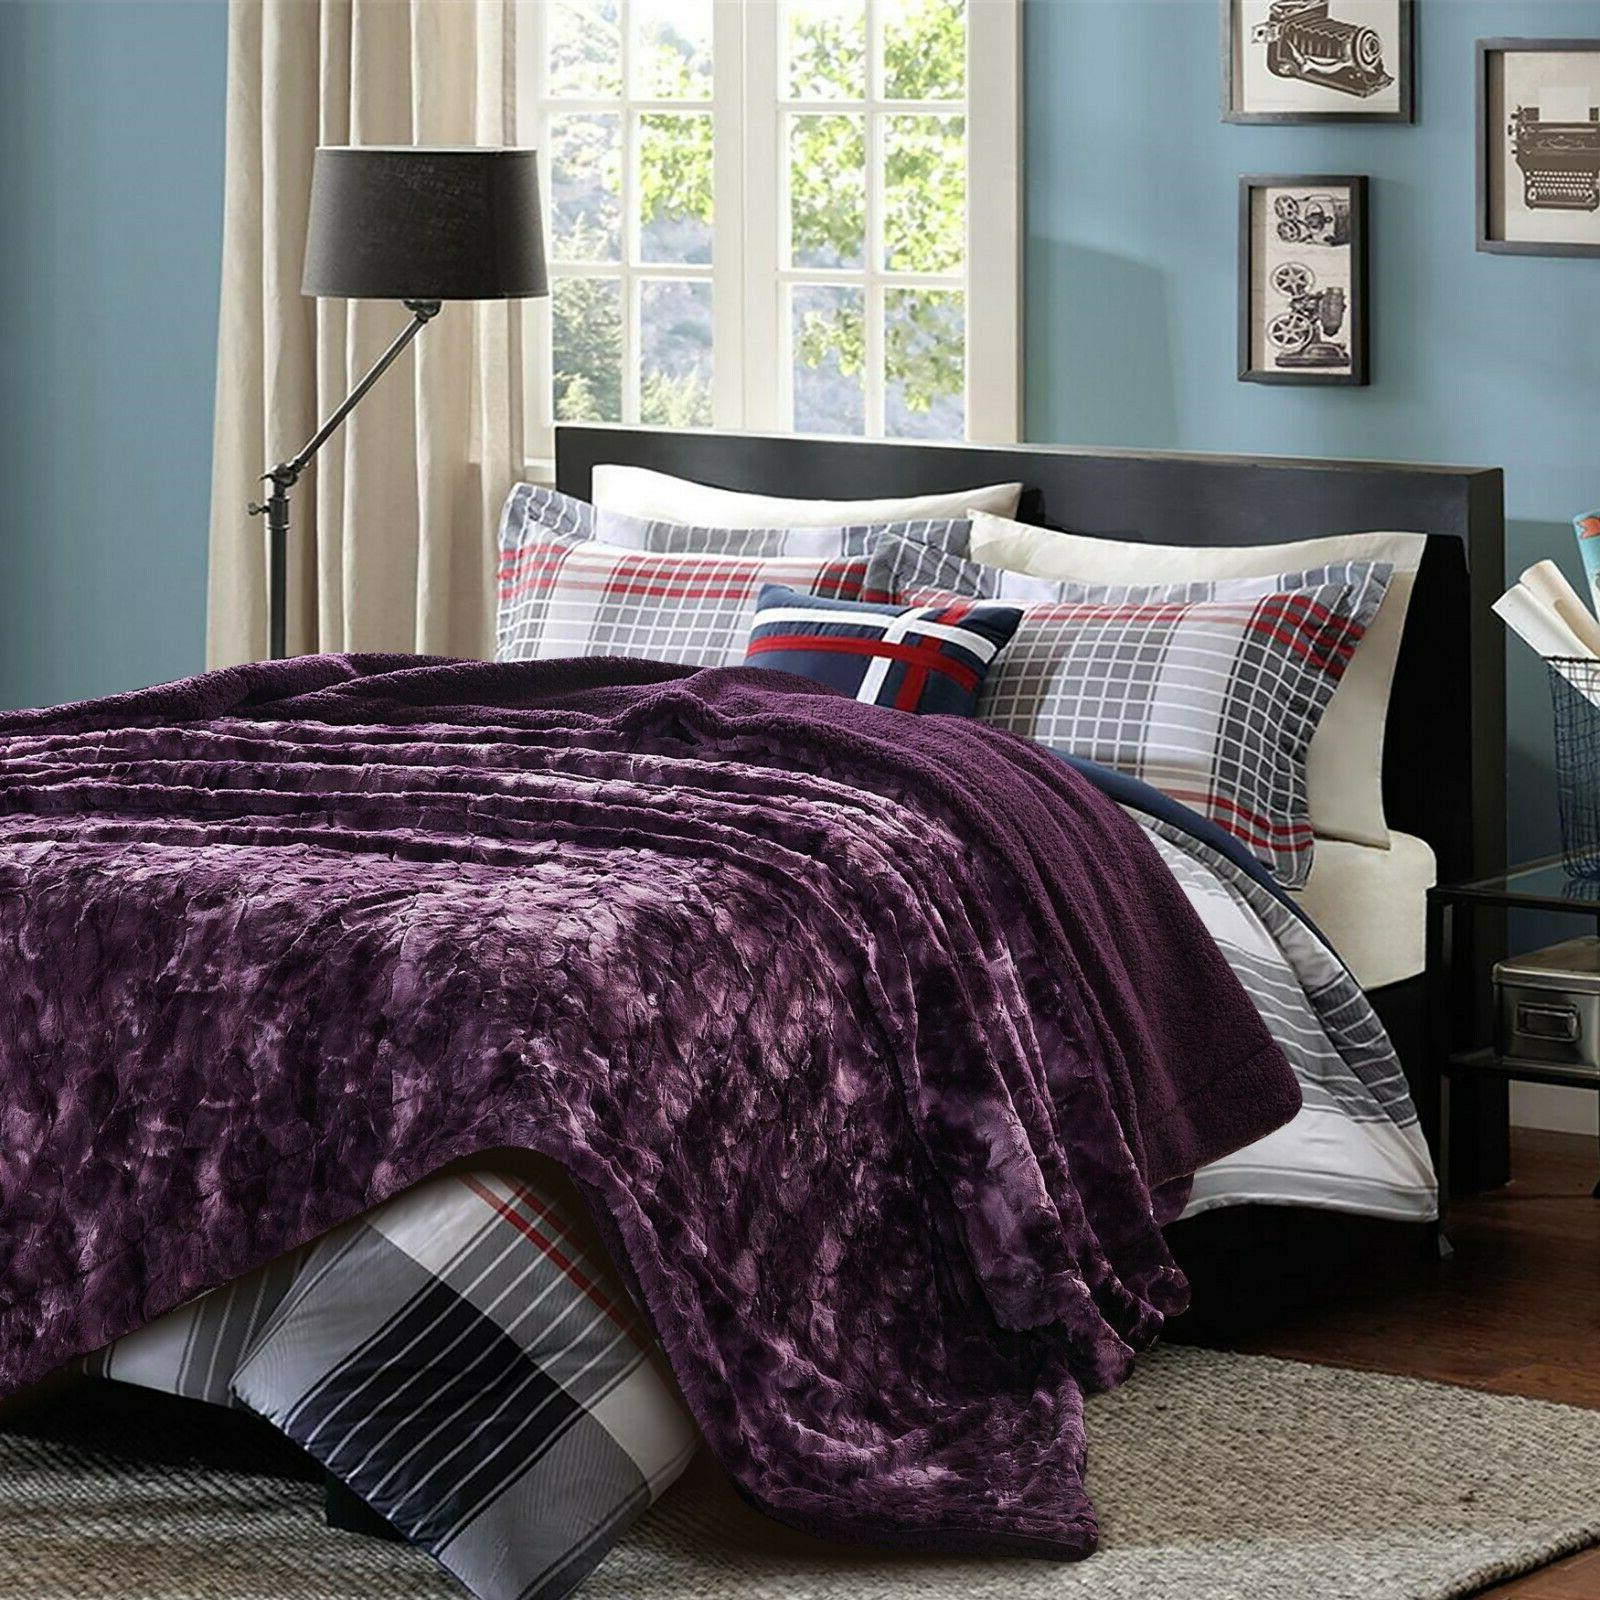 Chanasya Blanket Plush Fluffy Sherpa for Couch